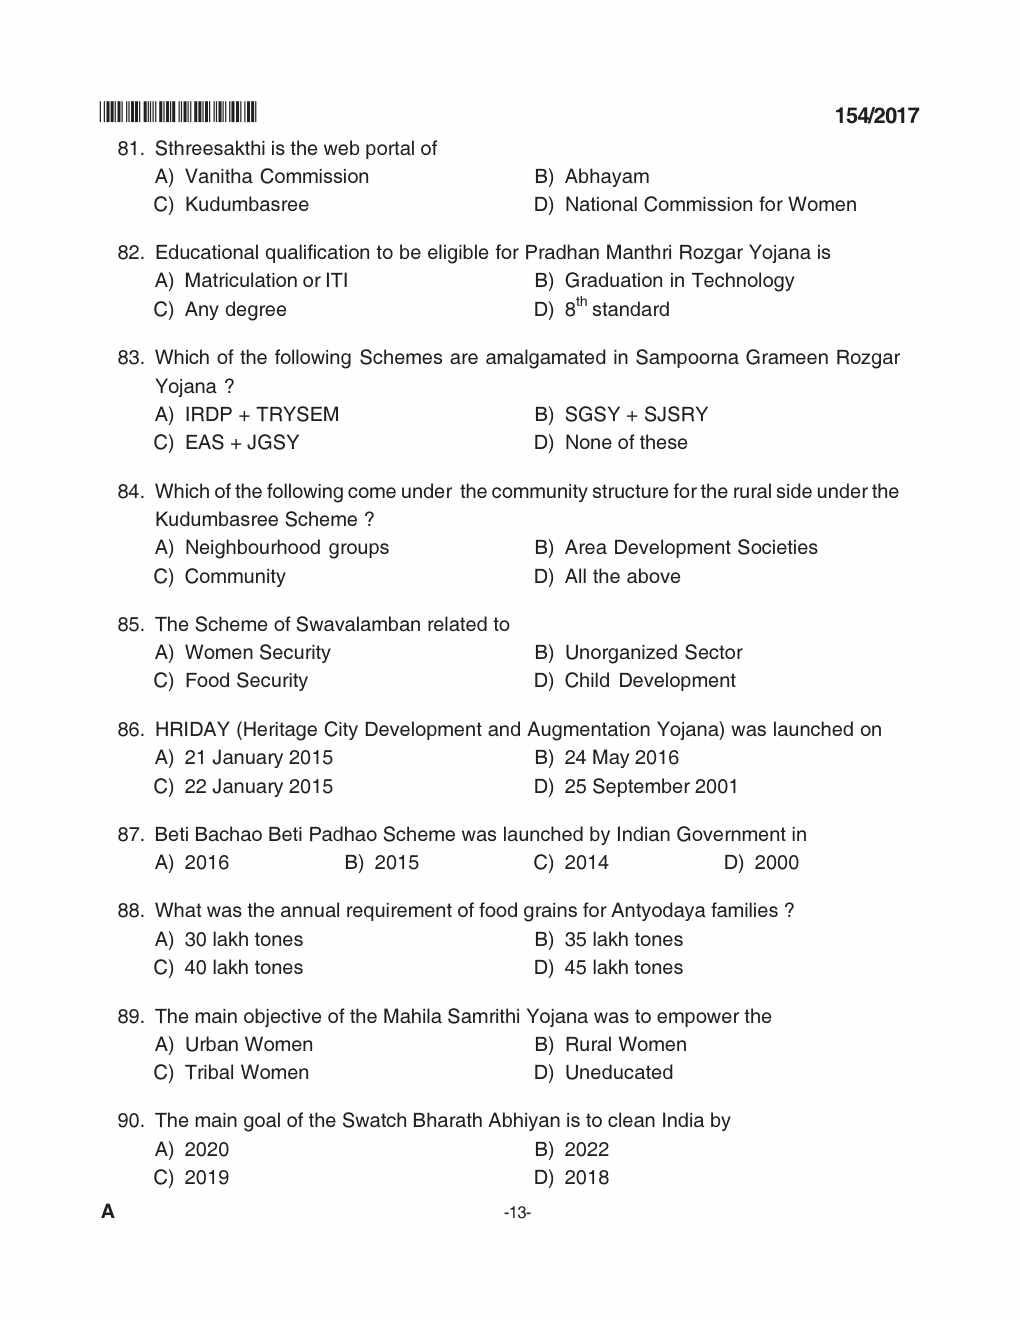 https://masterstudy.net/pdf/psc/armed-police-sub-inspector-trainee-sr-for-sc-st-police-armed-police-battalion/q_15420170013.jpg